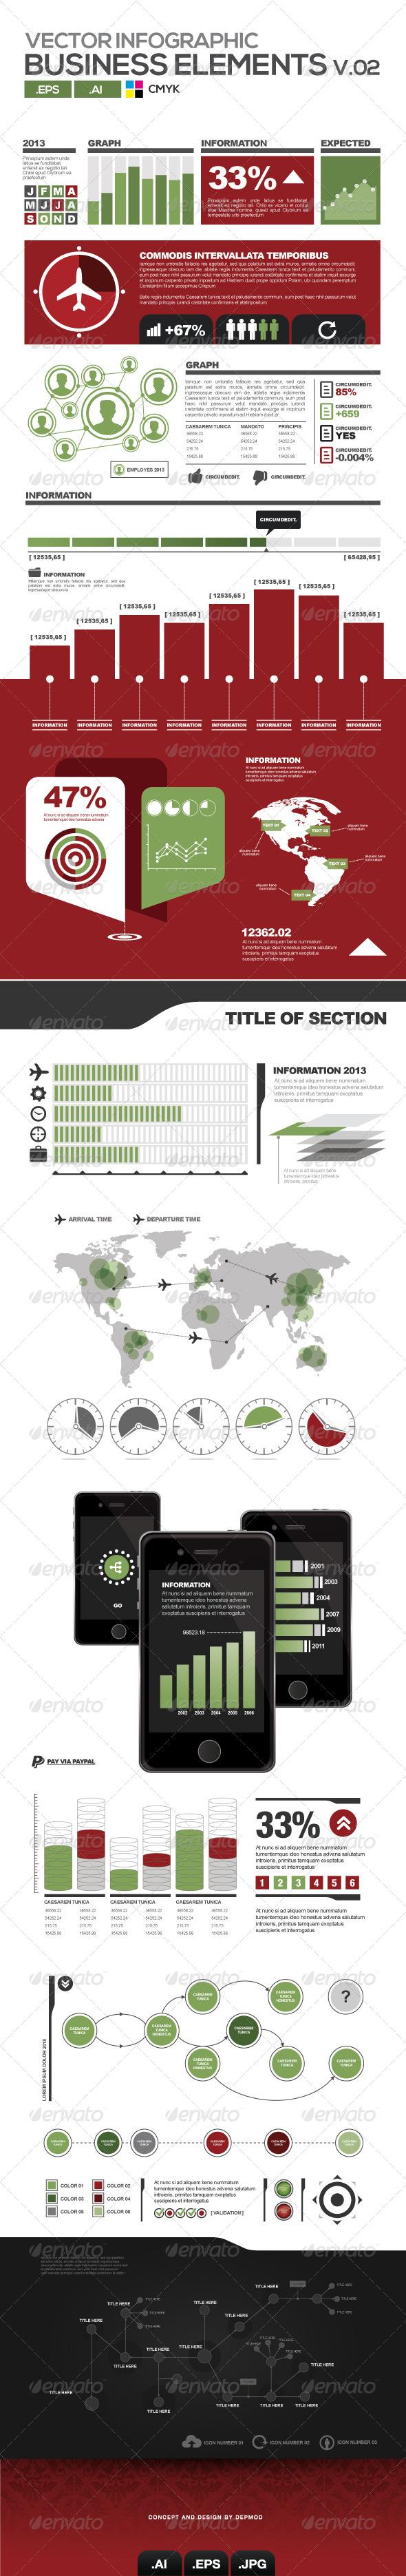 GraphicRiver Vectors Business Elements V02 4251608